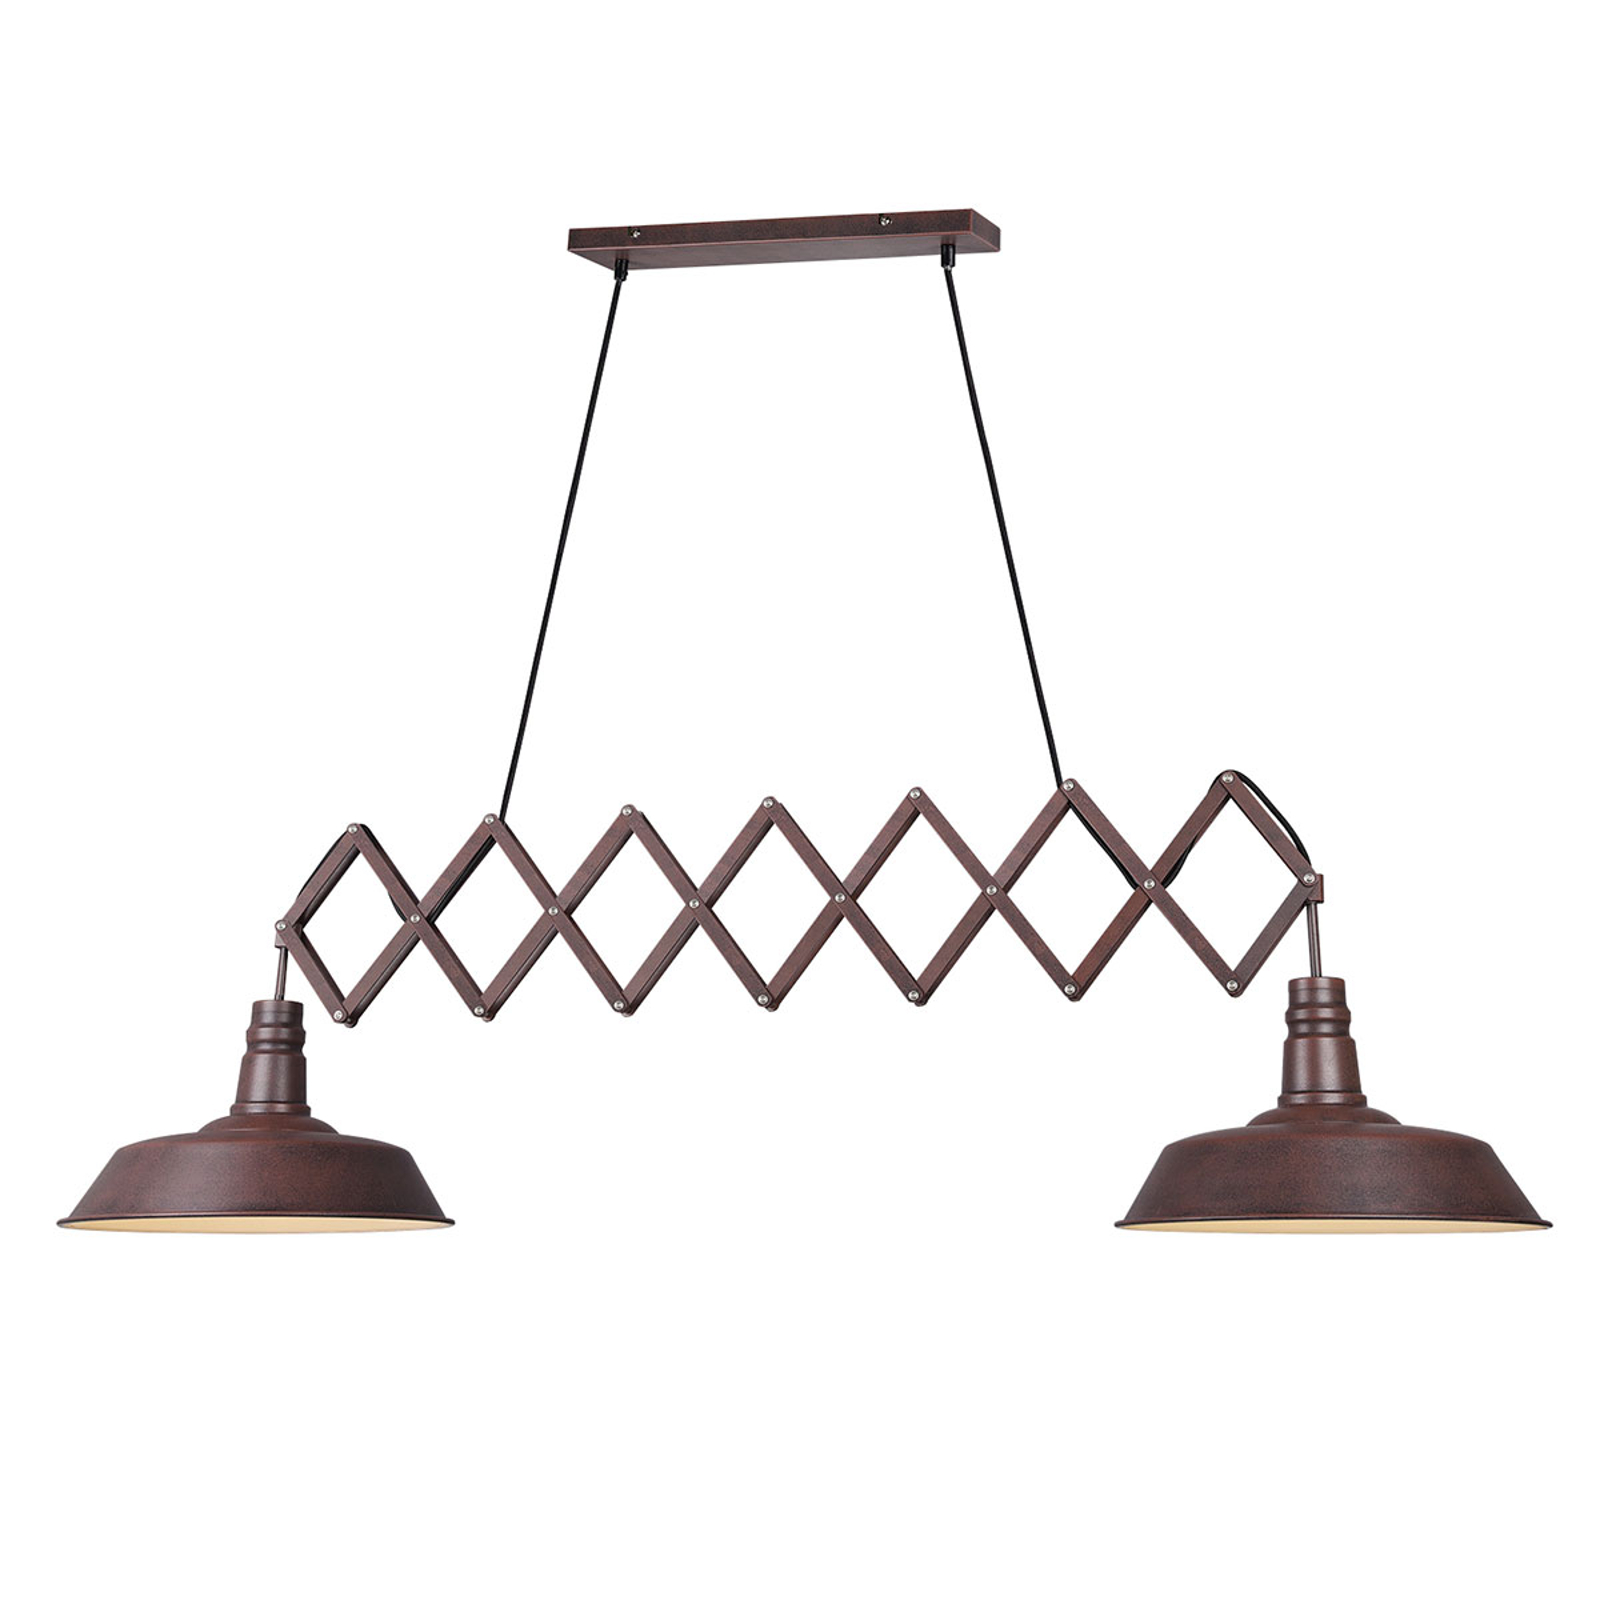 Hanglamp Detroit met twee lampjes in roestoptiek